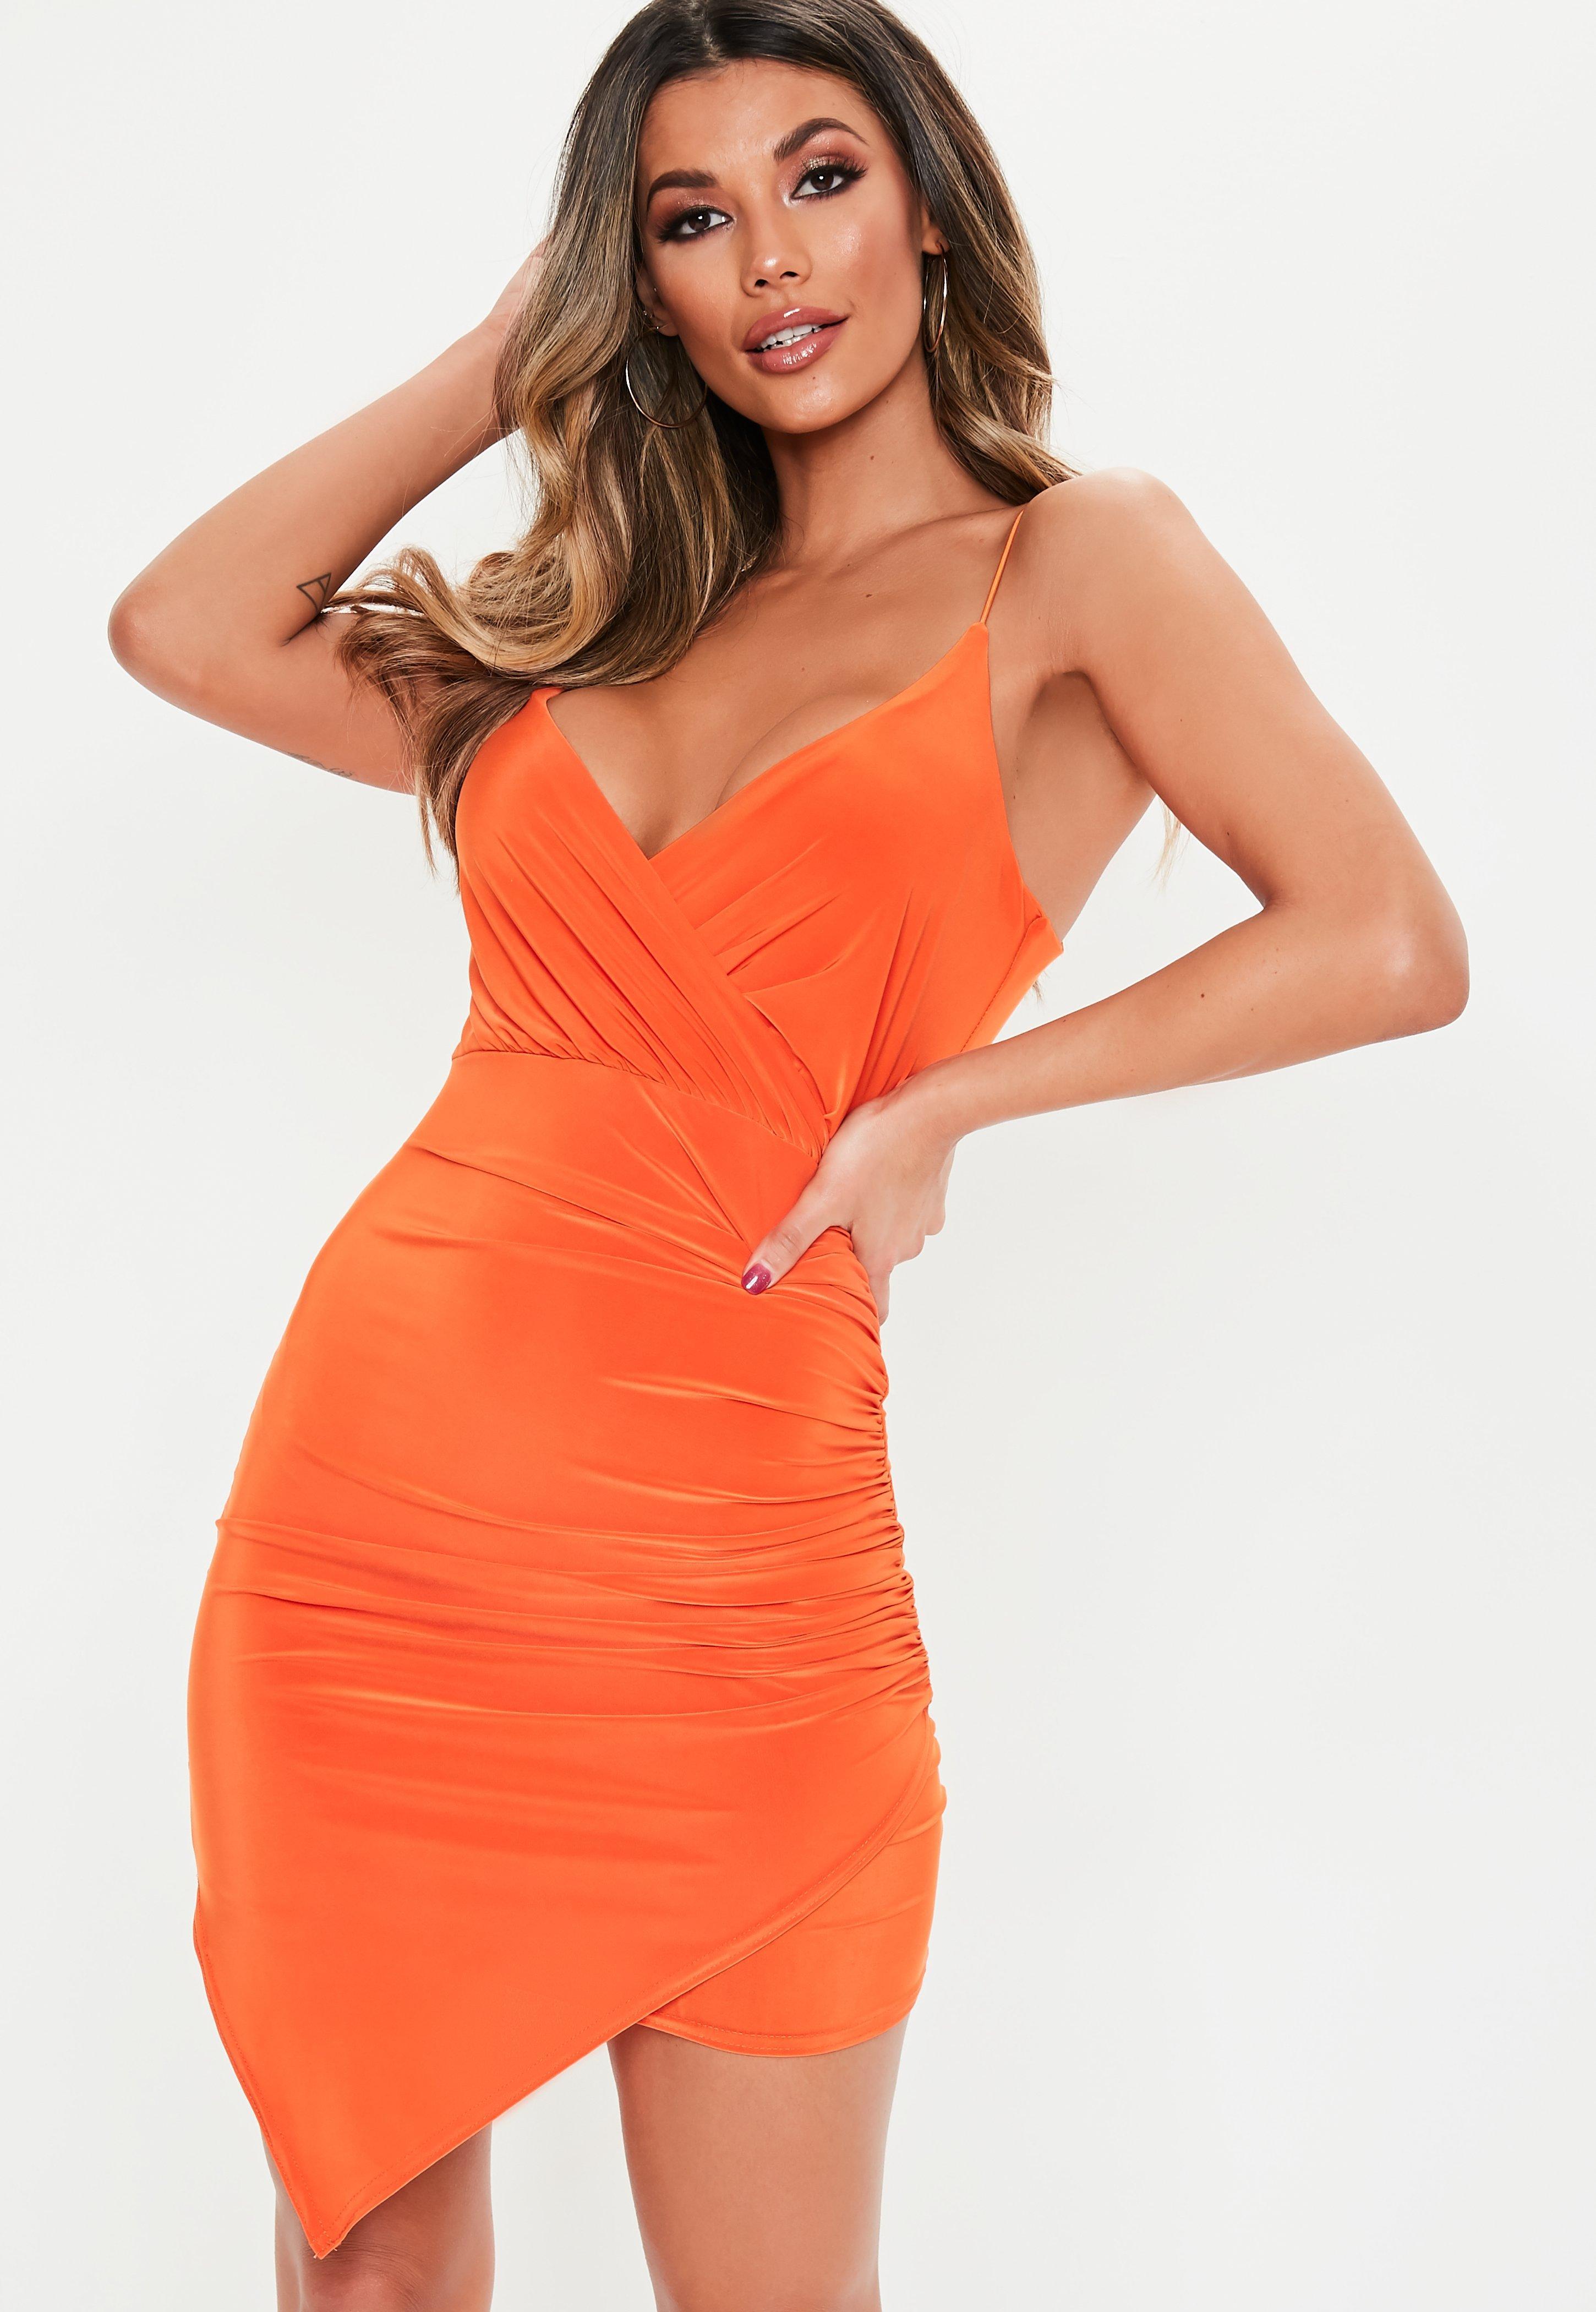 Orange Bodycon Dresses  bfcb2da12a